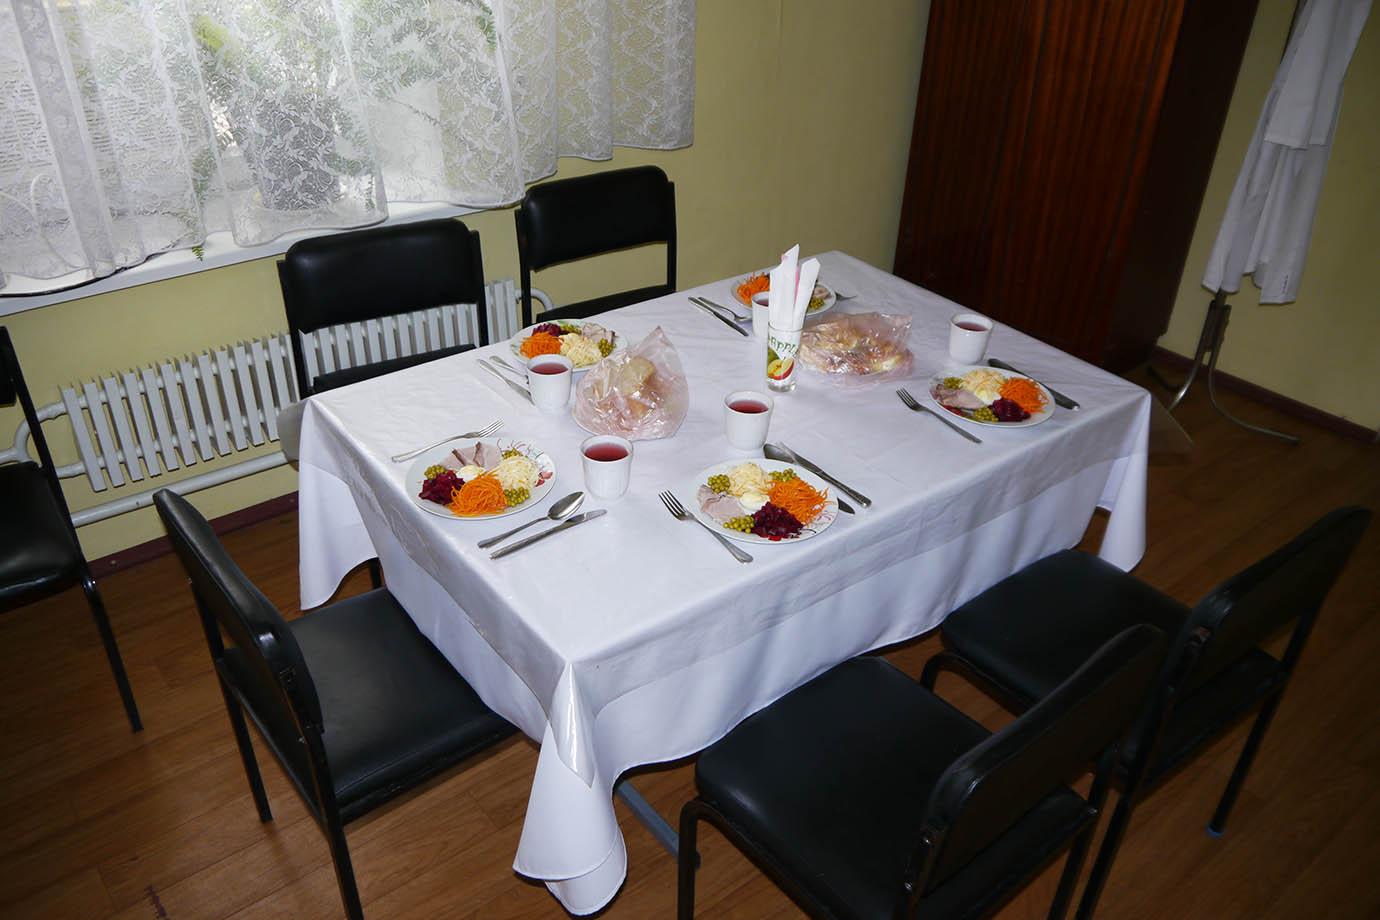 chernobyl-cafeteria30